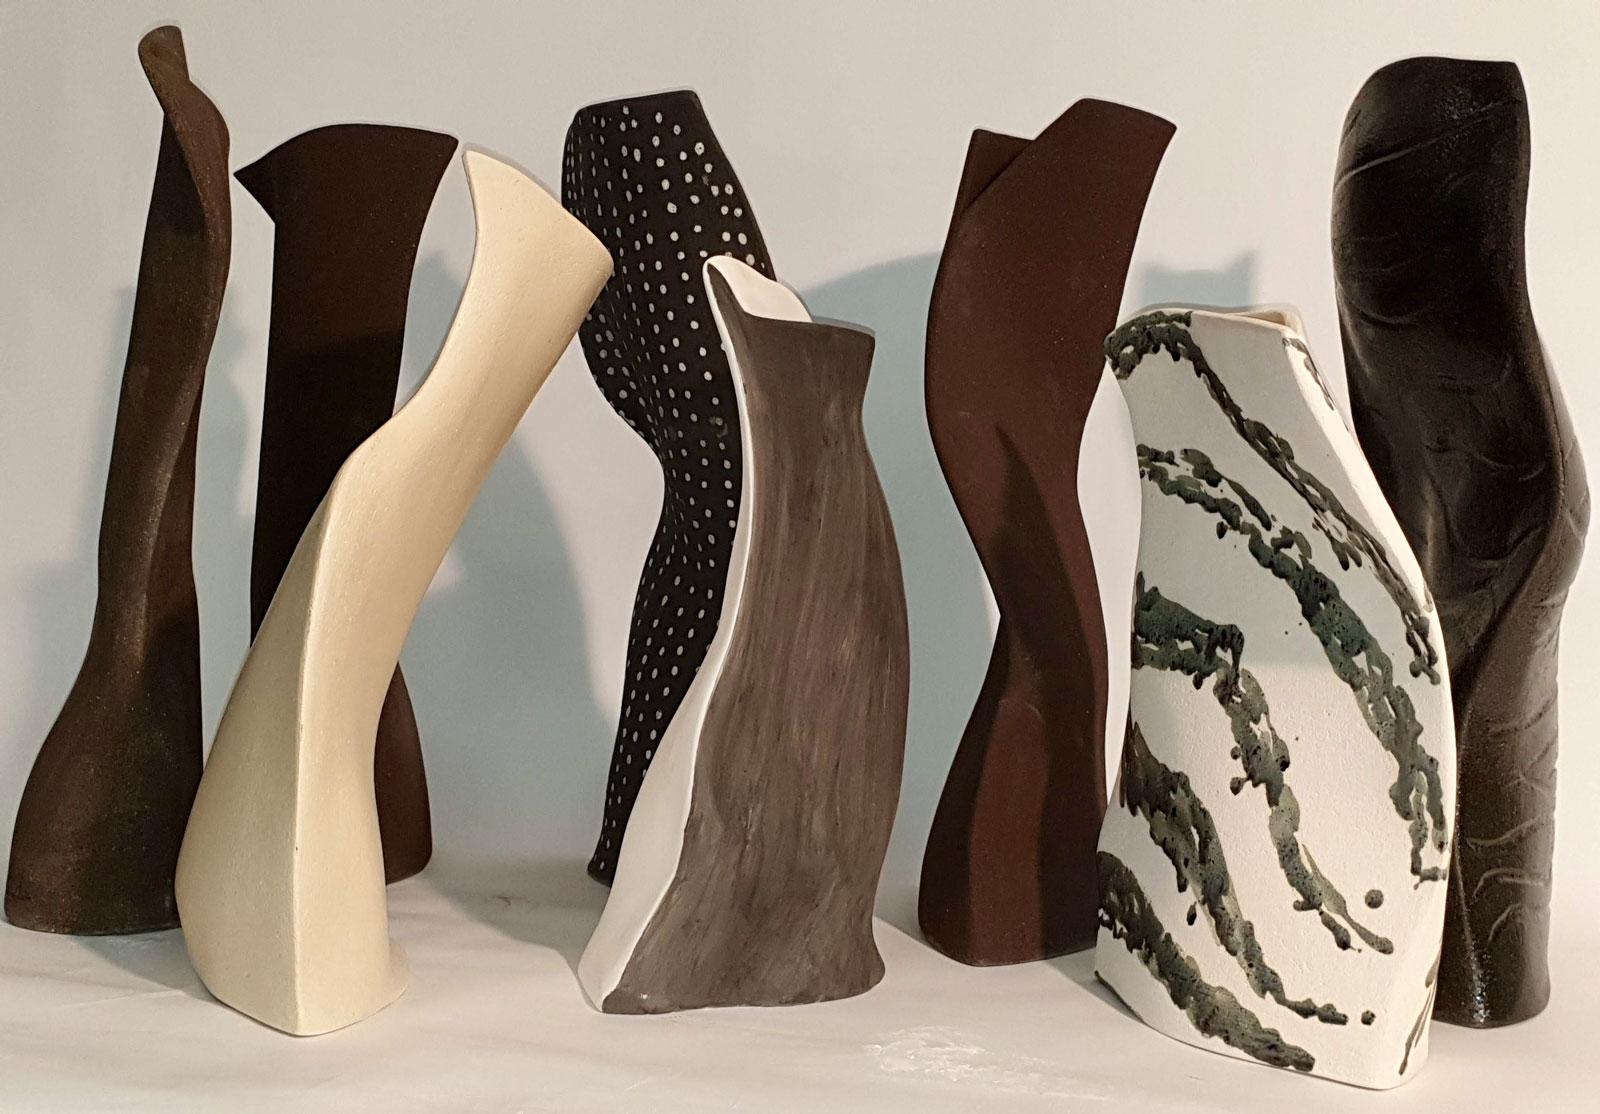 Esposizione di vasi in ceramica di design colorati